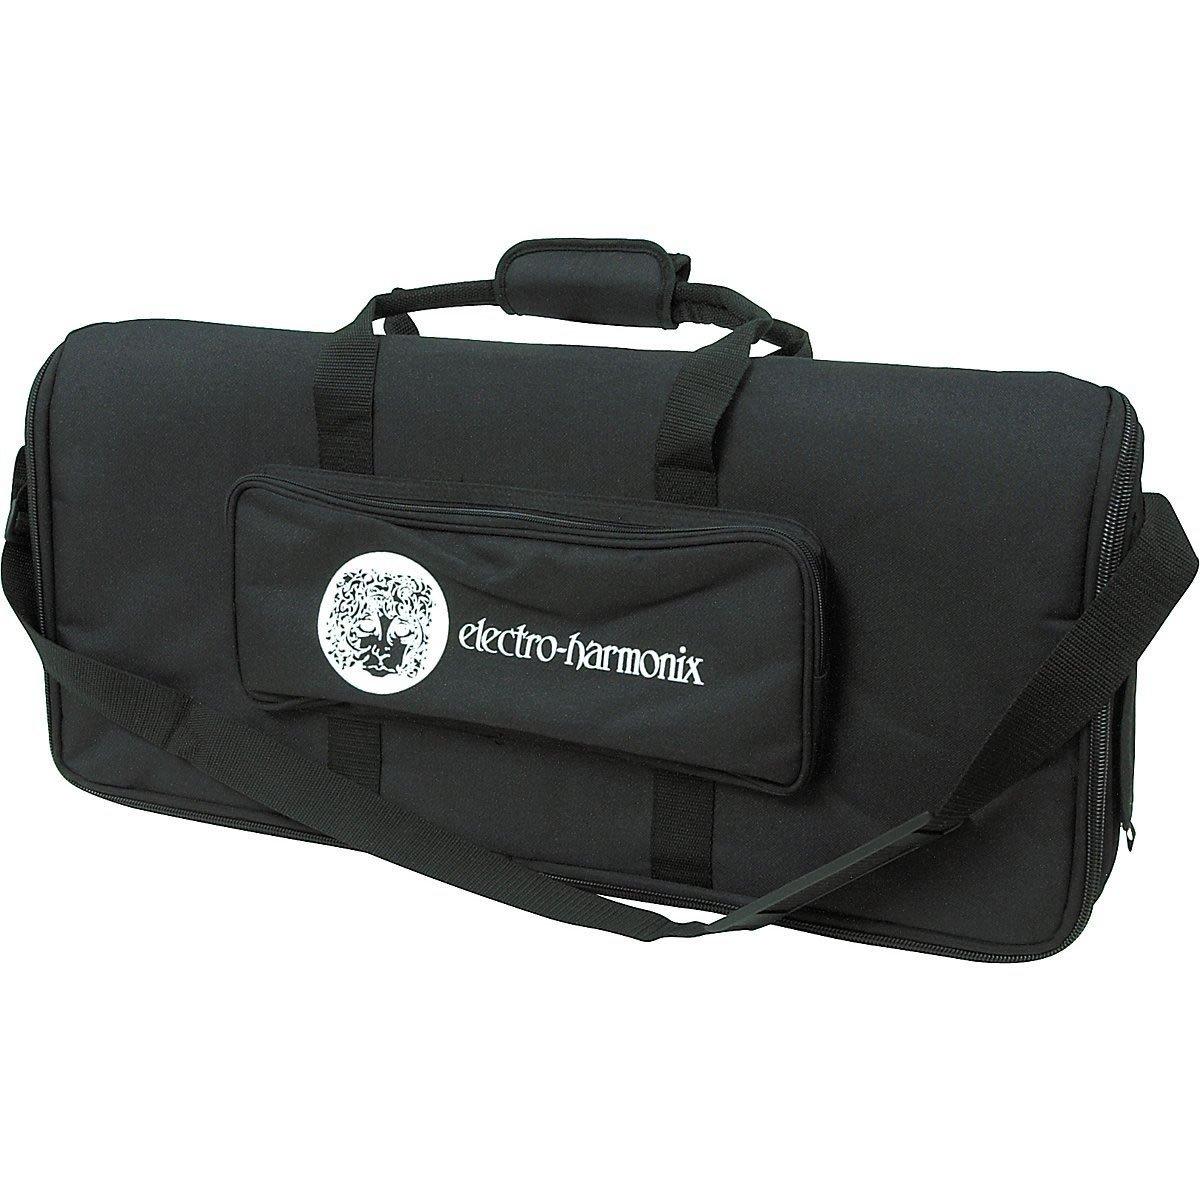 Electro-Harmonix Pedal Board Bag by Electro-Harmonix